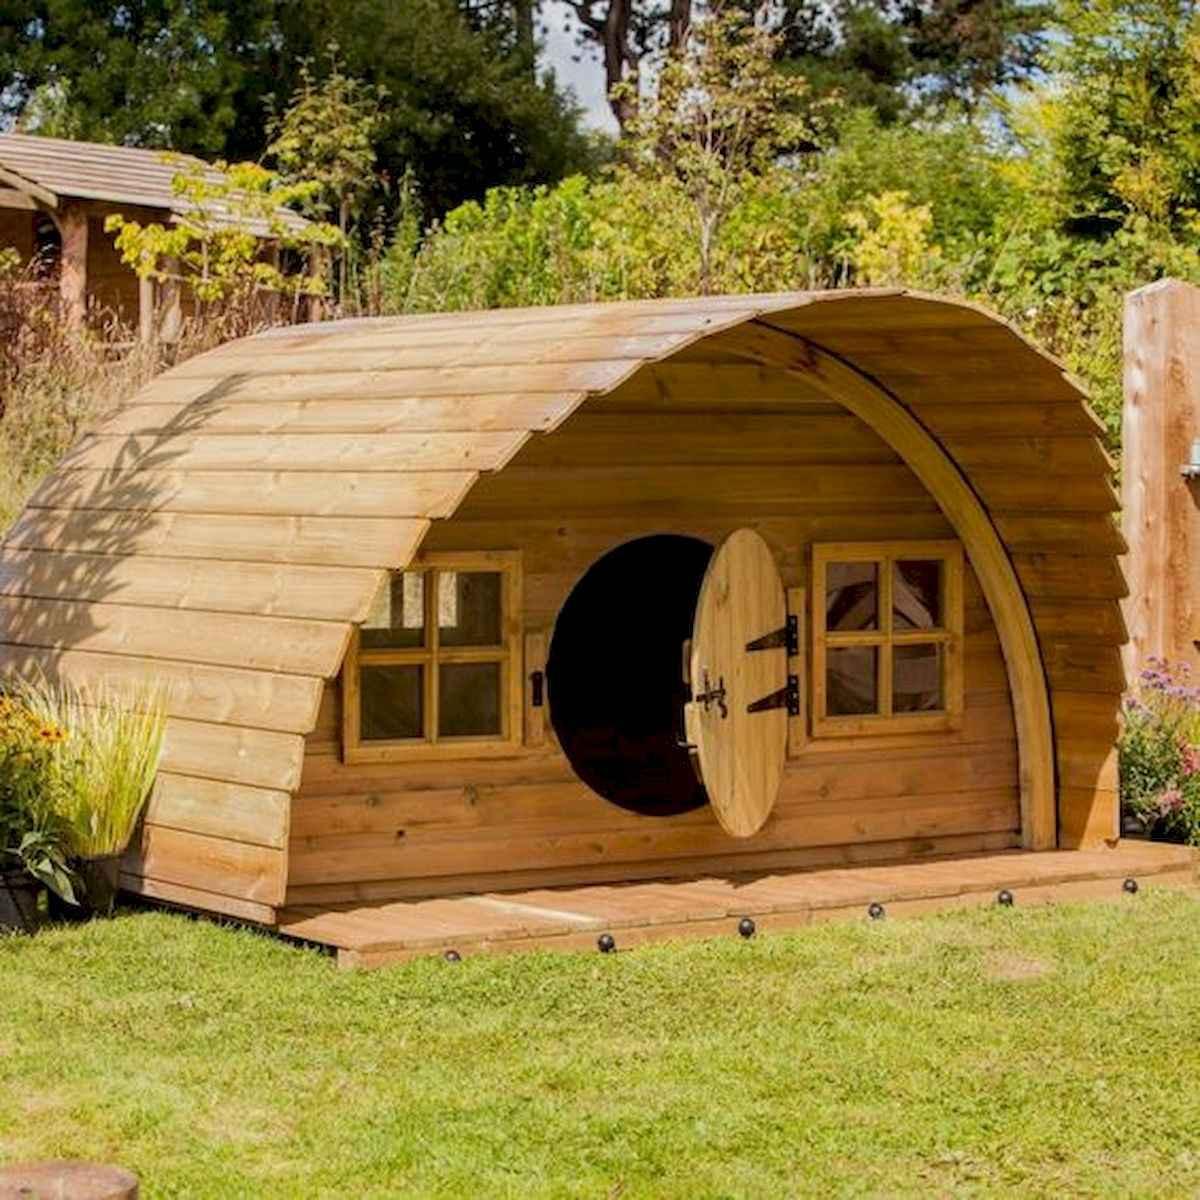 60 Amazing DIY Projects Otdoors Furniture Design Ideas (10)